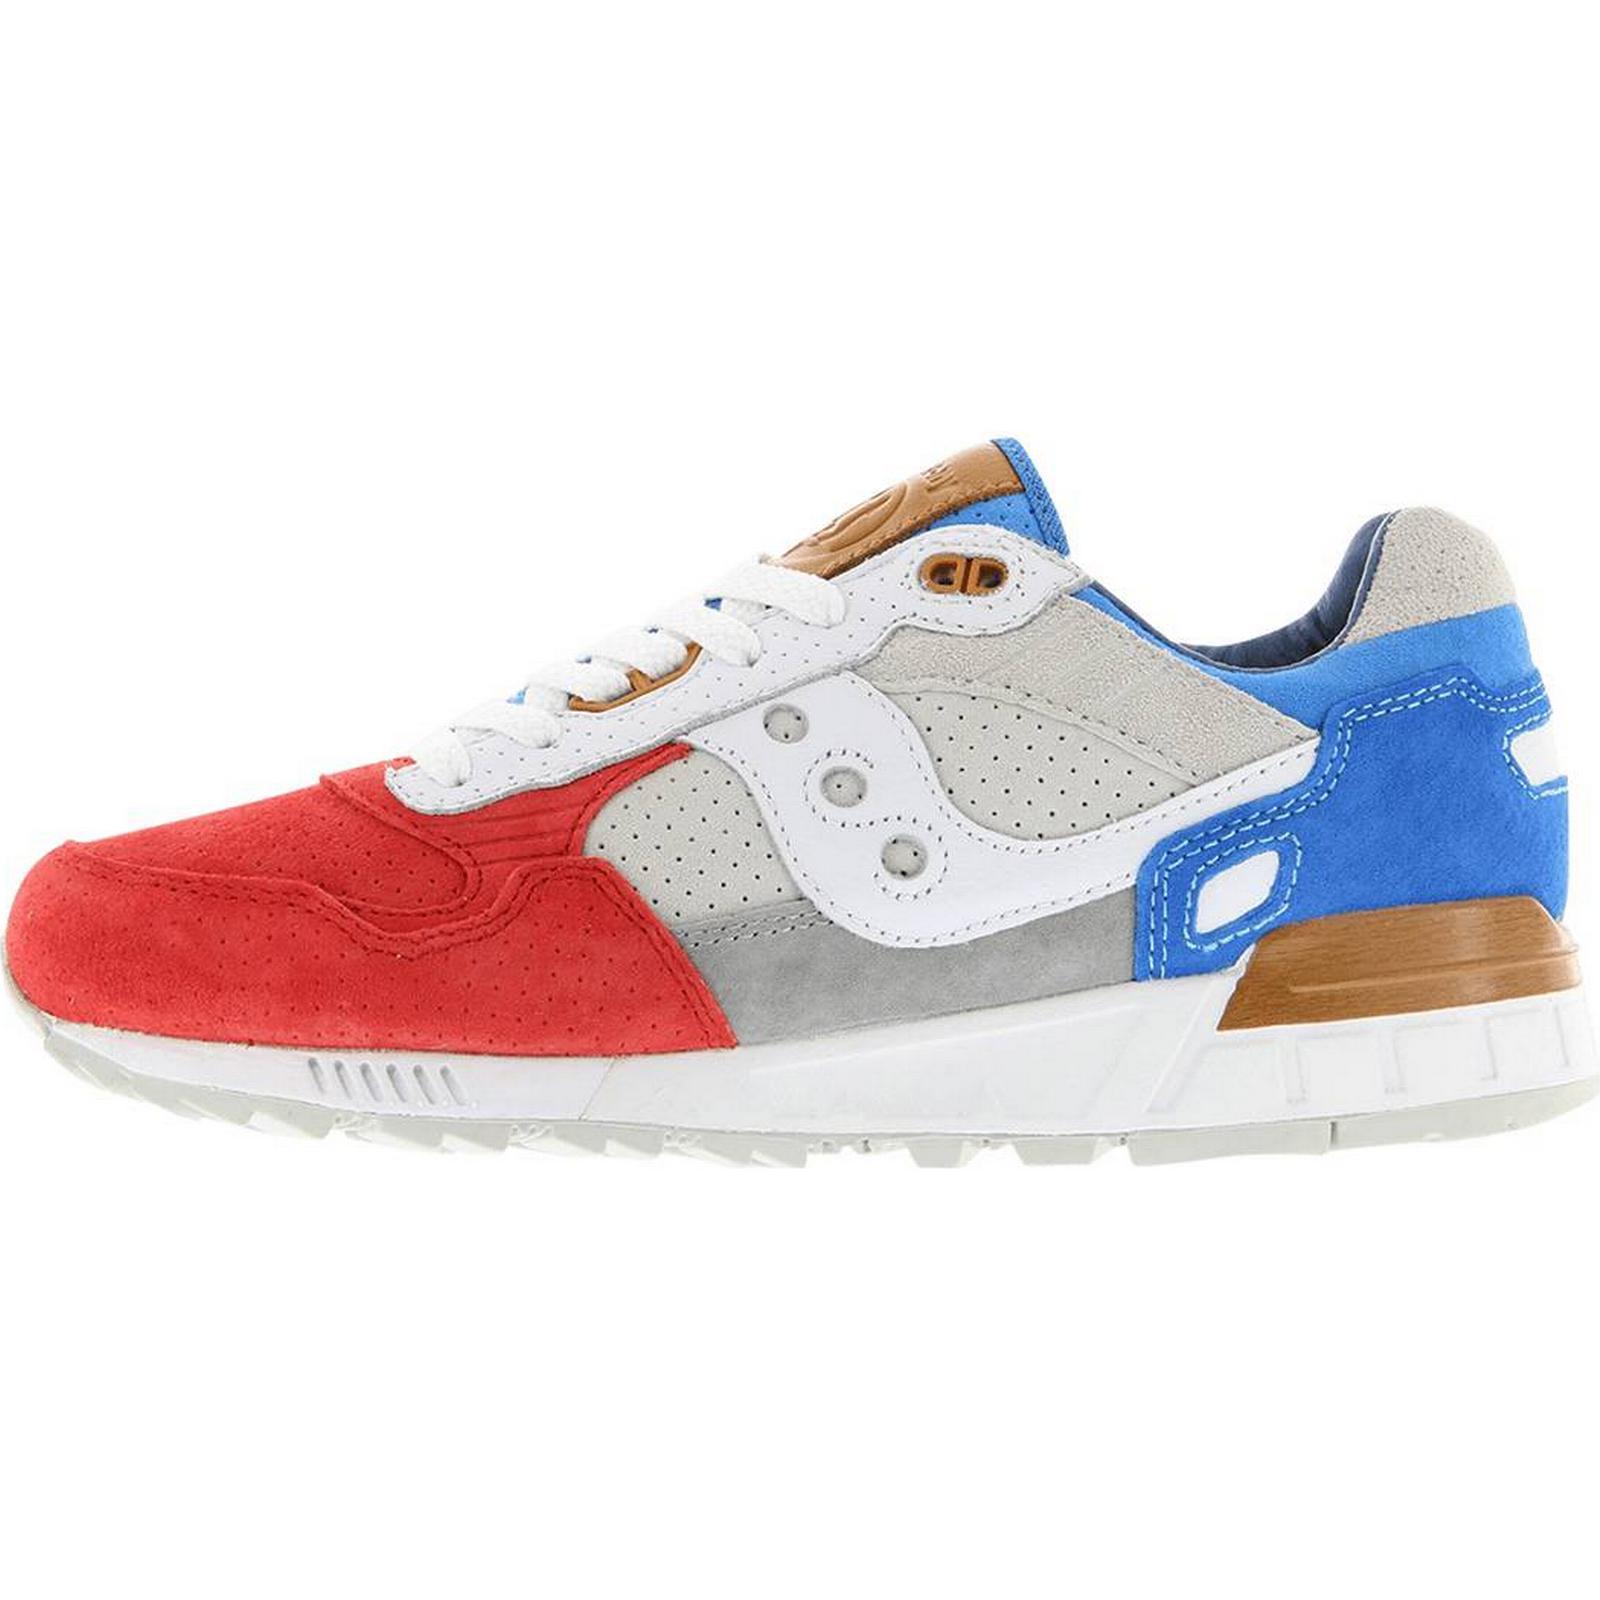 Saucony - Shadow 5000 x Sneakers76 - Saucony Multicolor 6ece1d